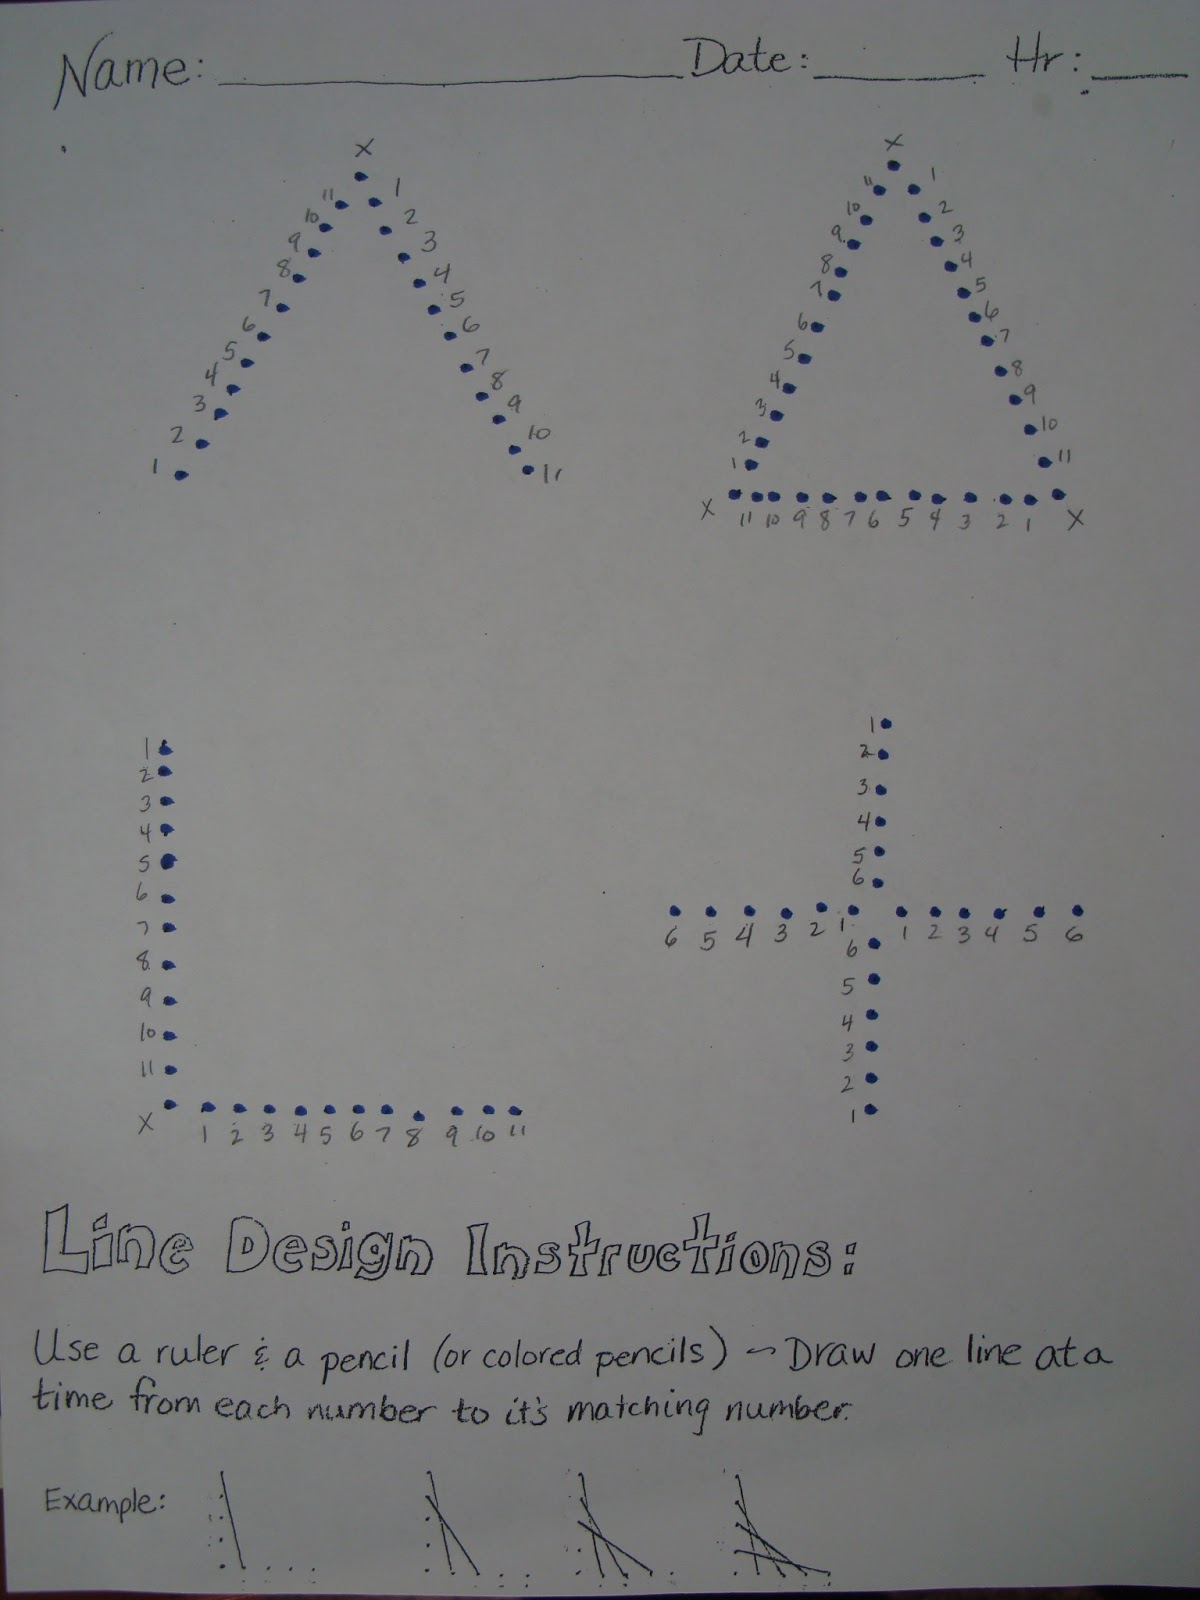 hight resolution of Adventures of a Middle School Art Teacher: 7th Grade String Art